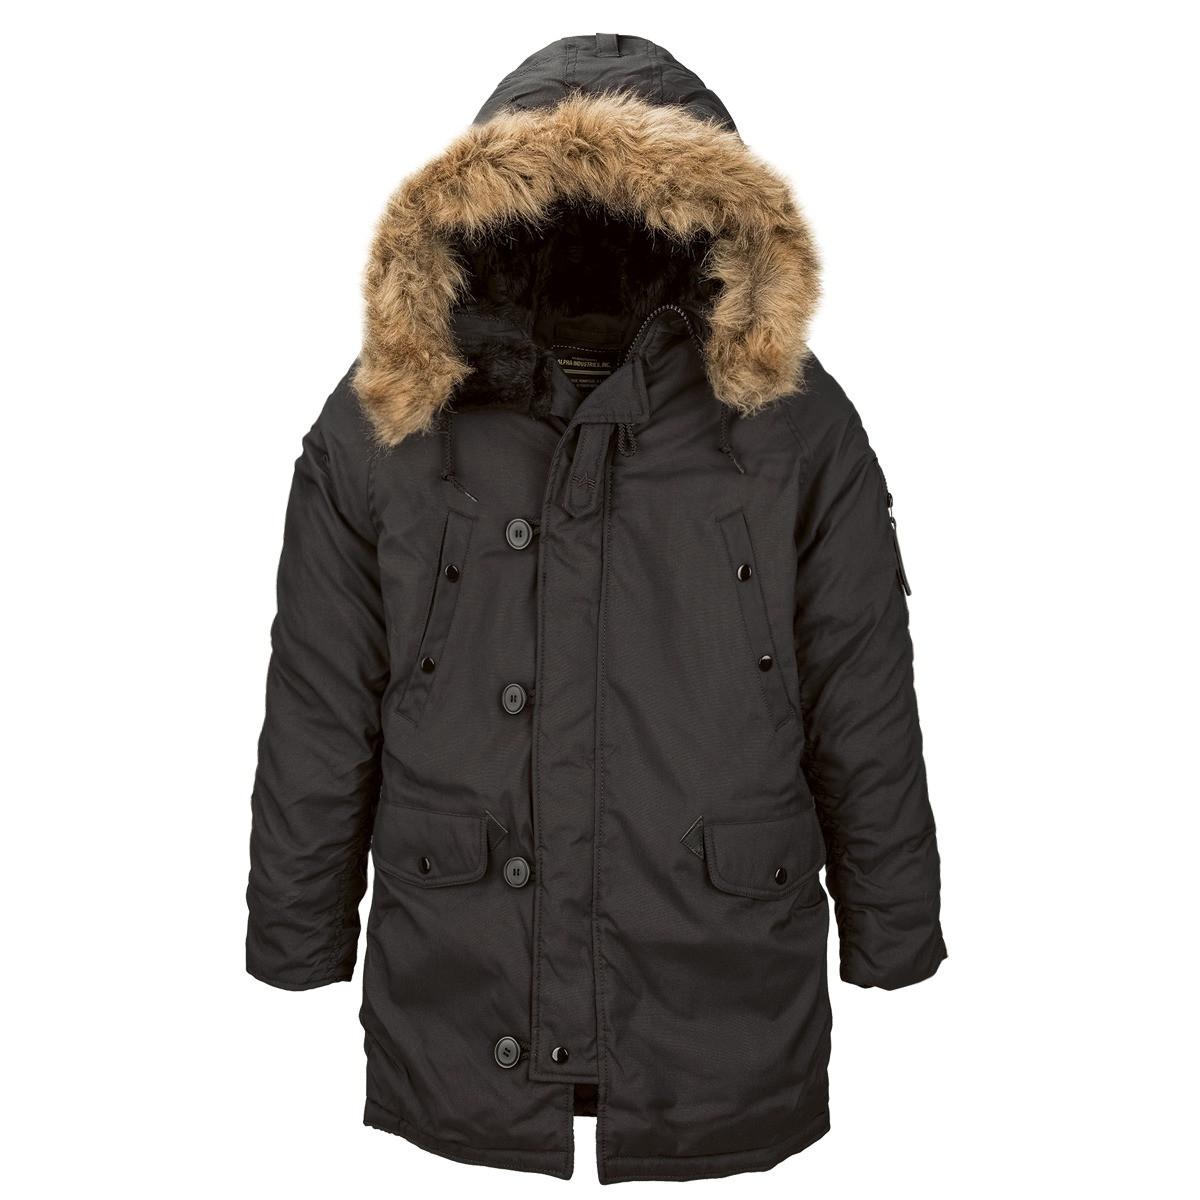 Куртка зимняя мужская Altitude от Alpha Industries